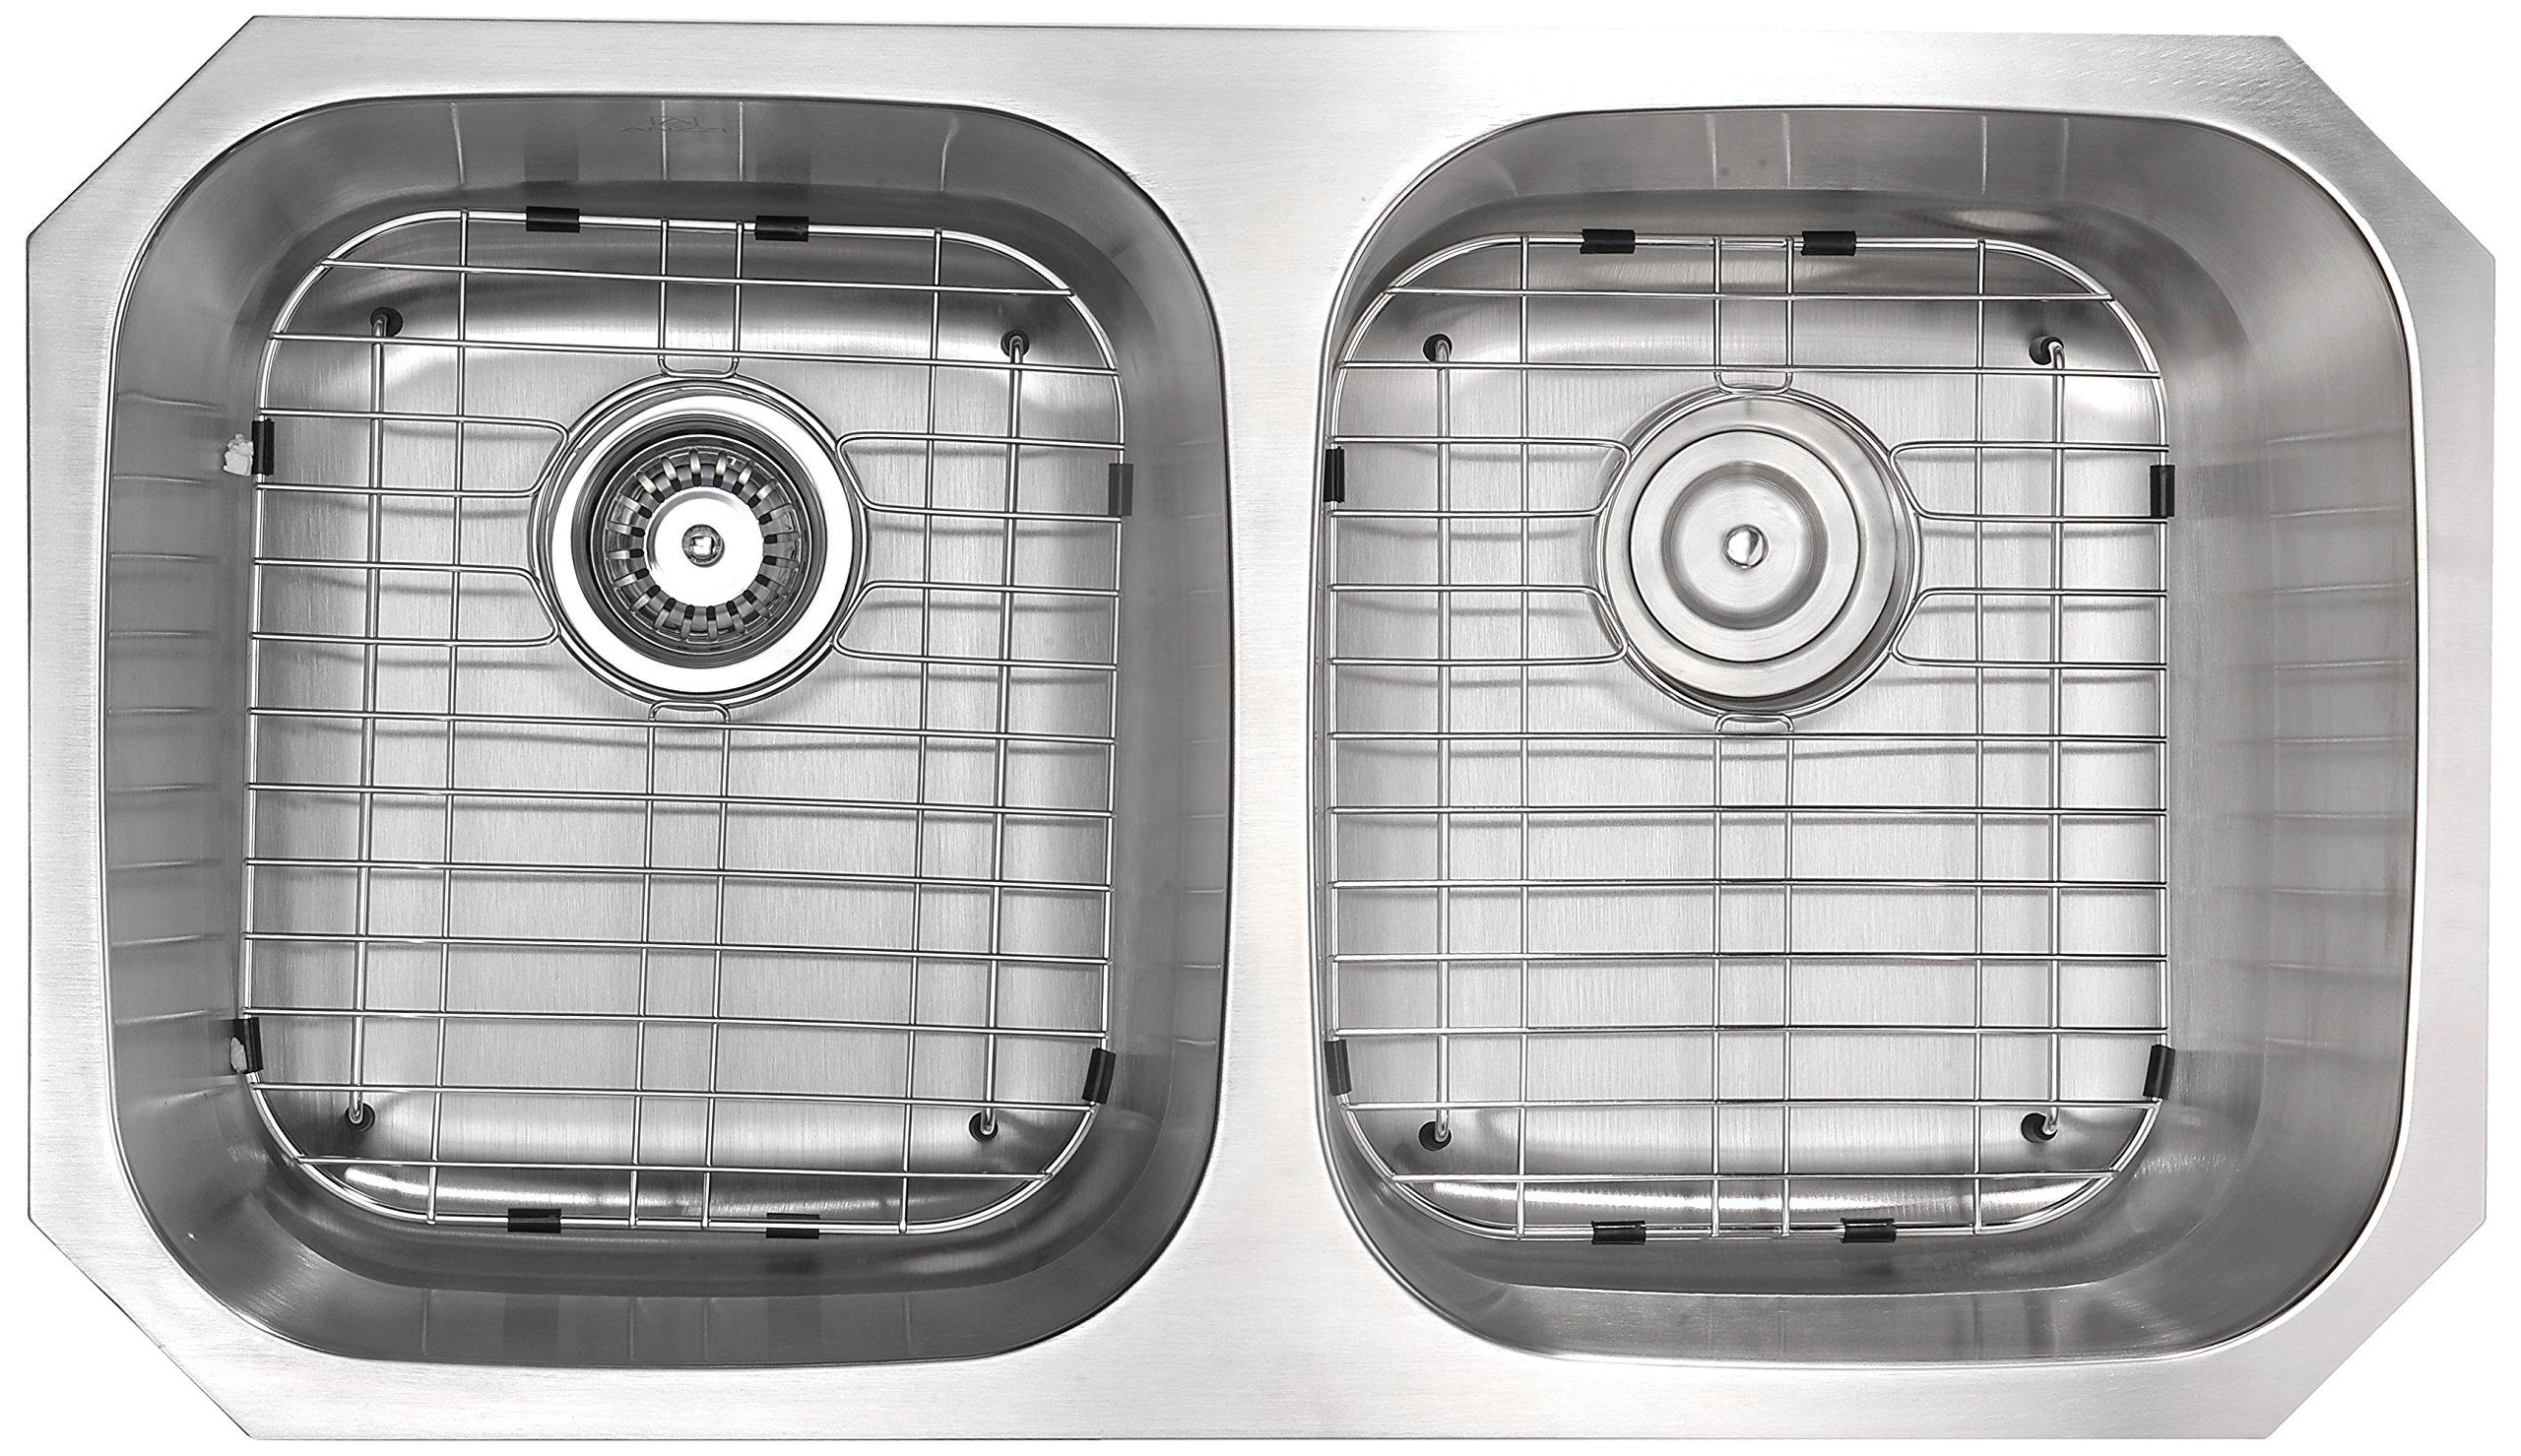 Anzzi Moore 32 Inch 304 Stainless Steel Undermount Double Kitchen Sink With 50 50 Split 16 Gauge Deep Soak Dual Basin Bowl Kitchen Sink With Bottom Grid Strainer And Drain K Az3218 2b Amazon Com